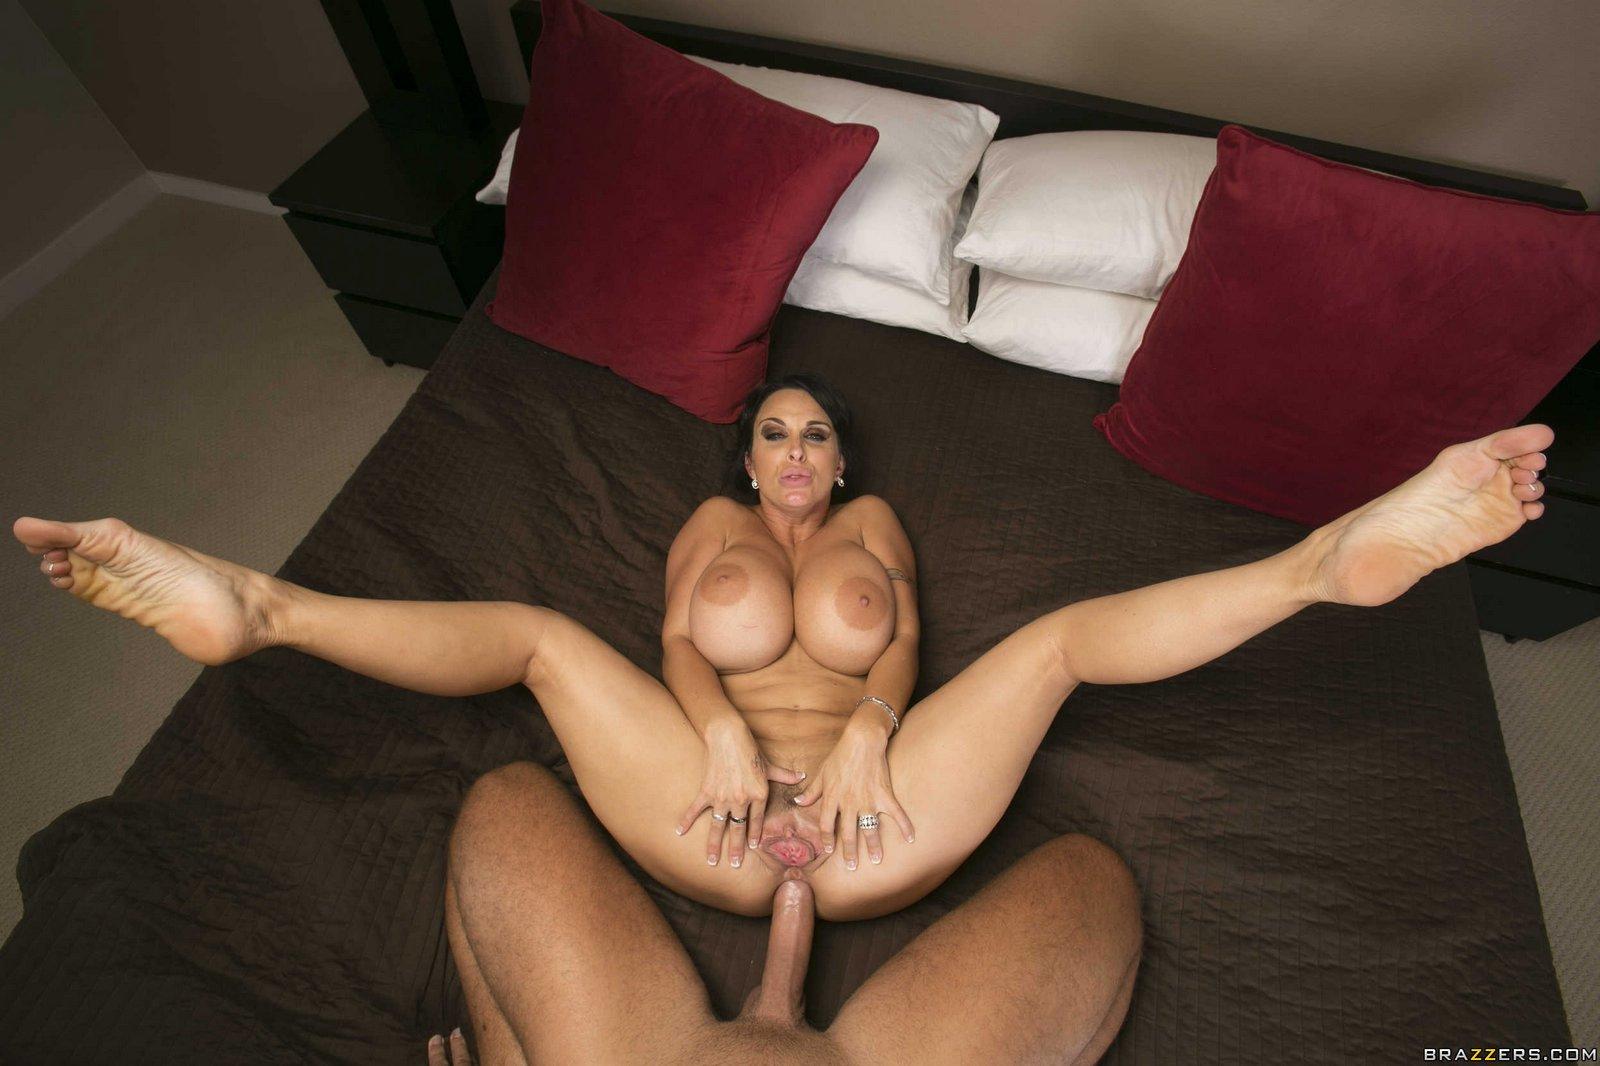 Holly halston porn pics